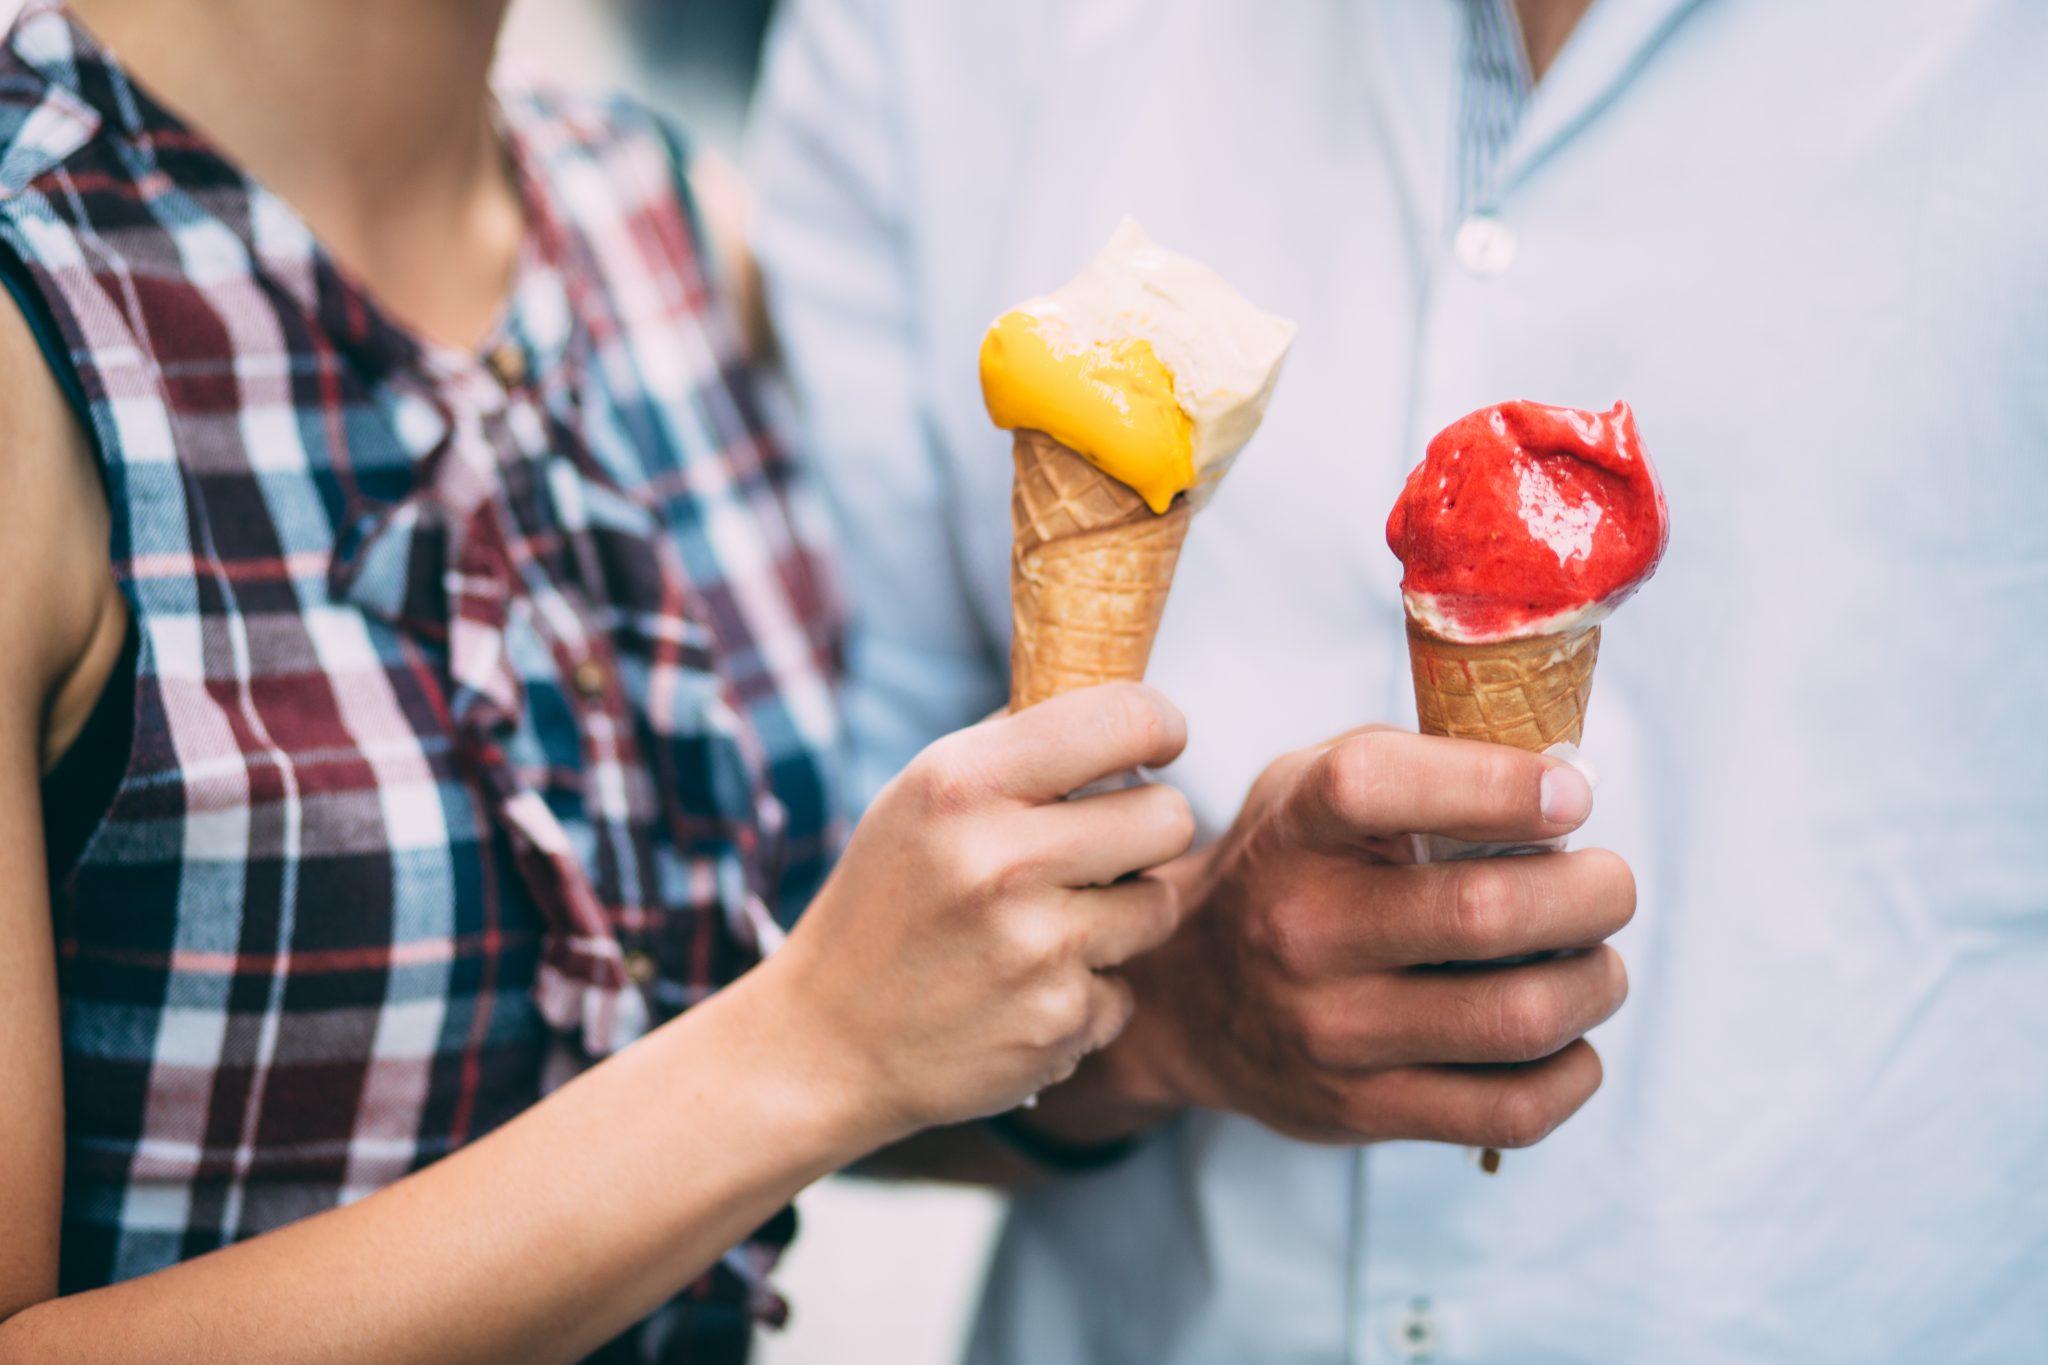 Couple with Ice Cream Cones in the City